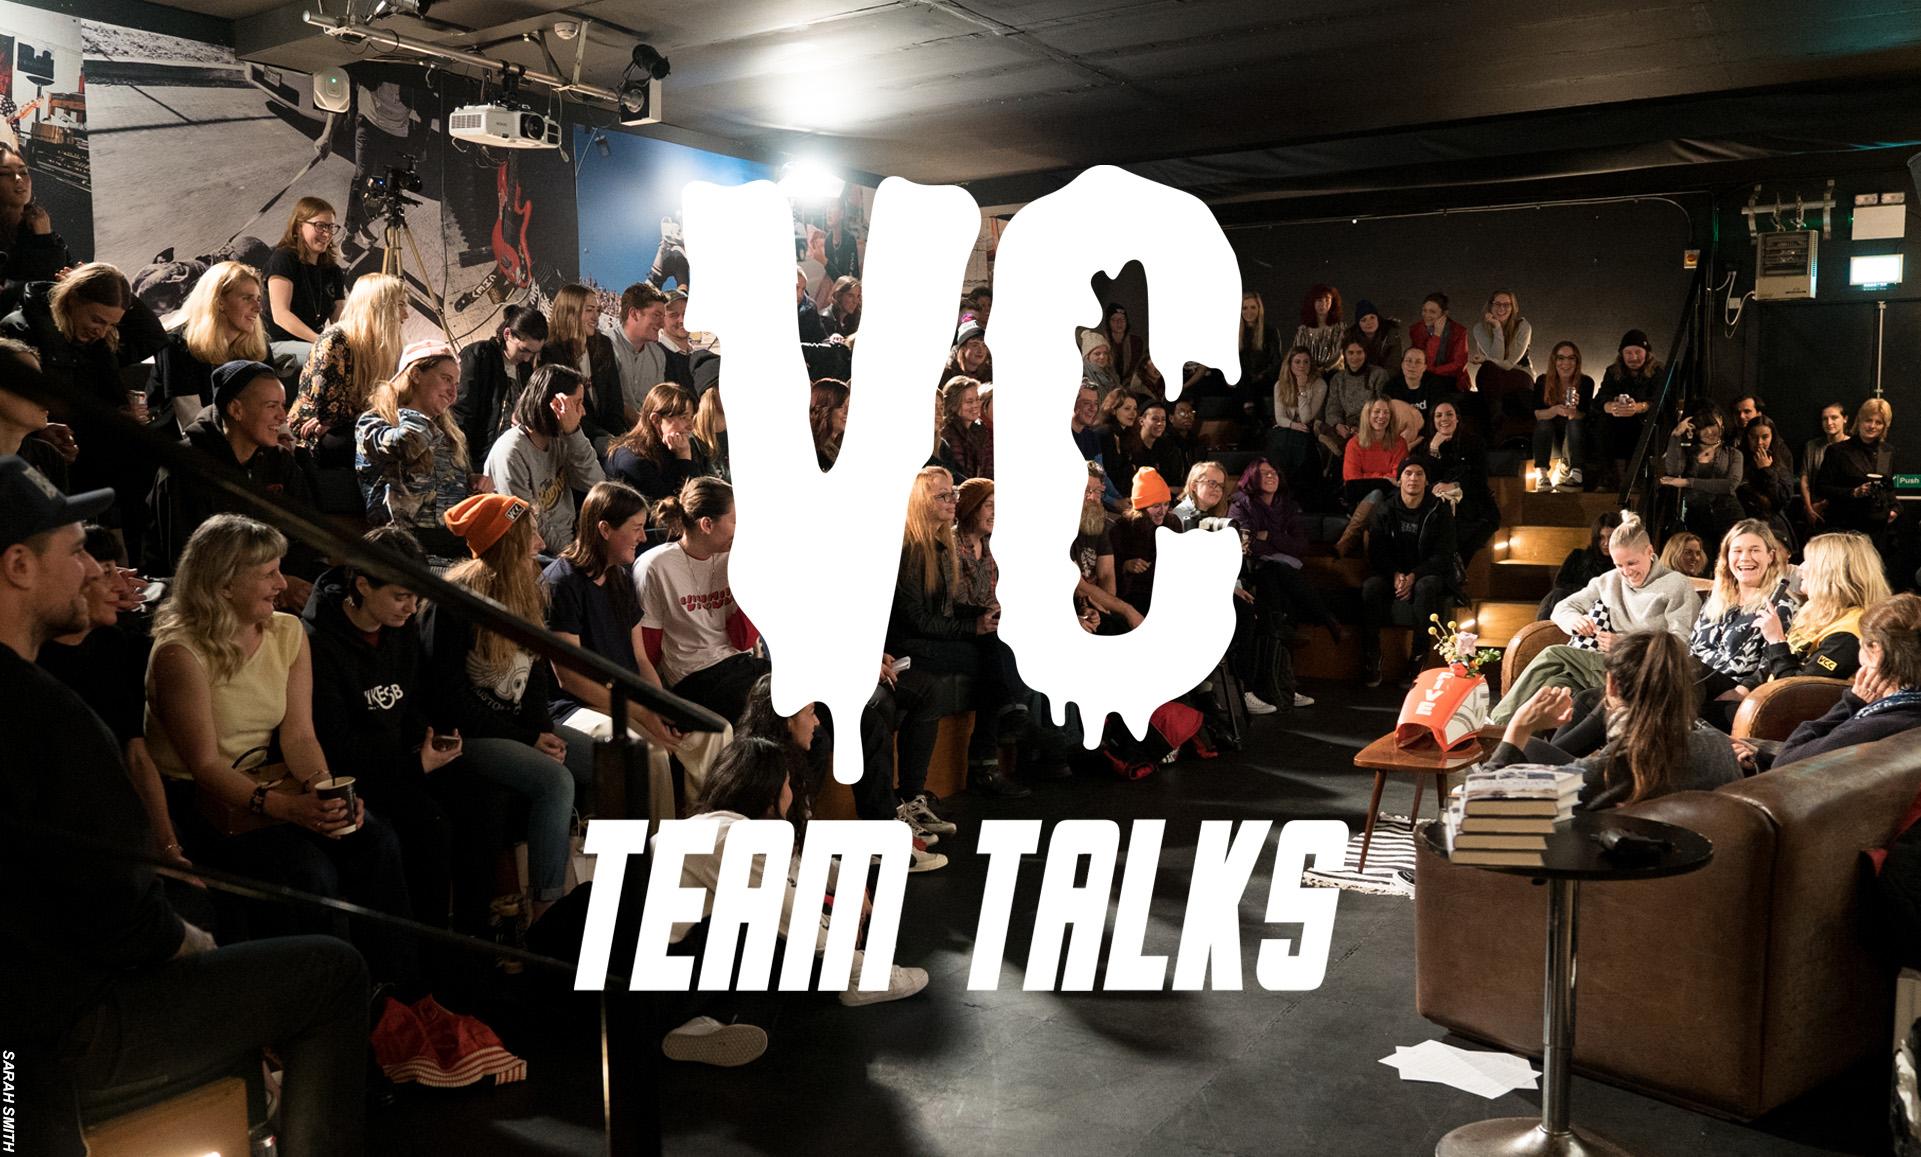 vc+team+talks+HOUSE+OF+VANS+.jpg